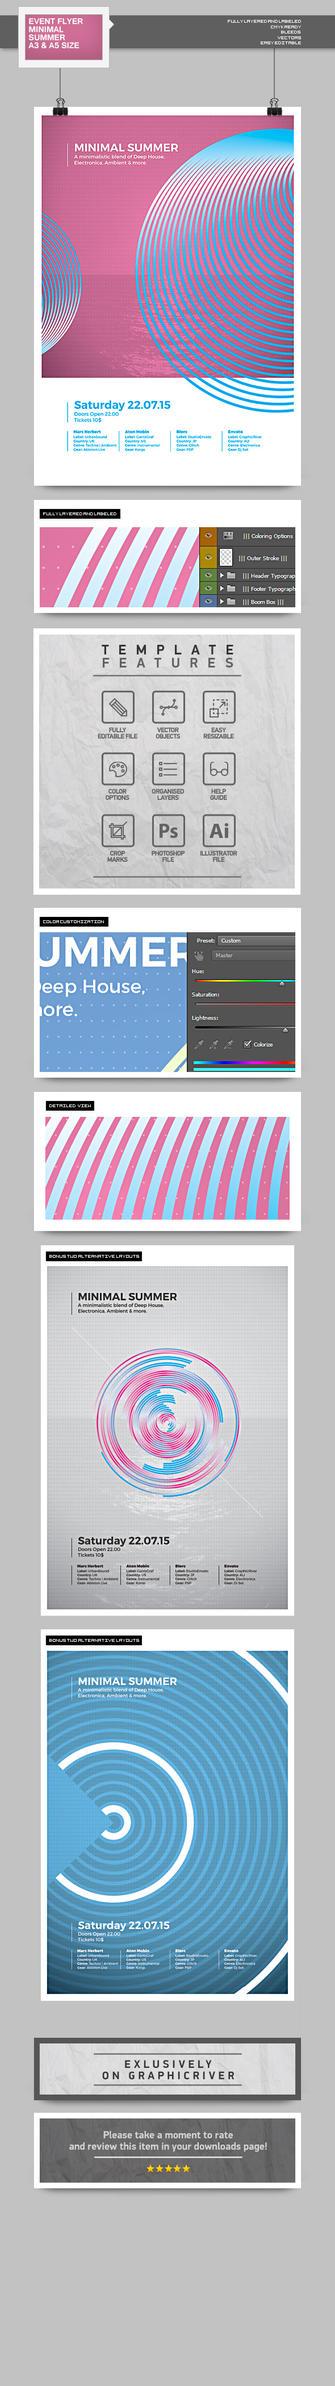 Flyer - Poster: Minimal Summer by blercstudio